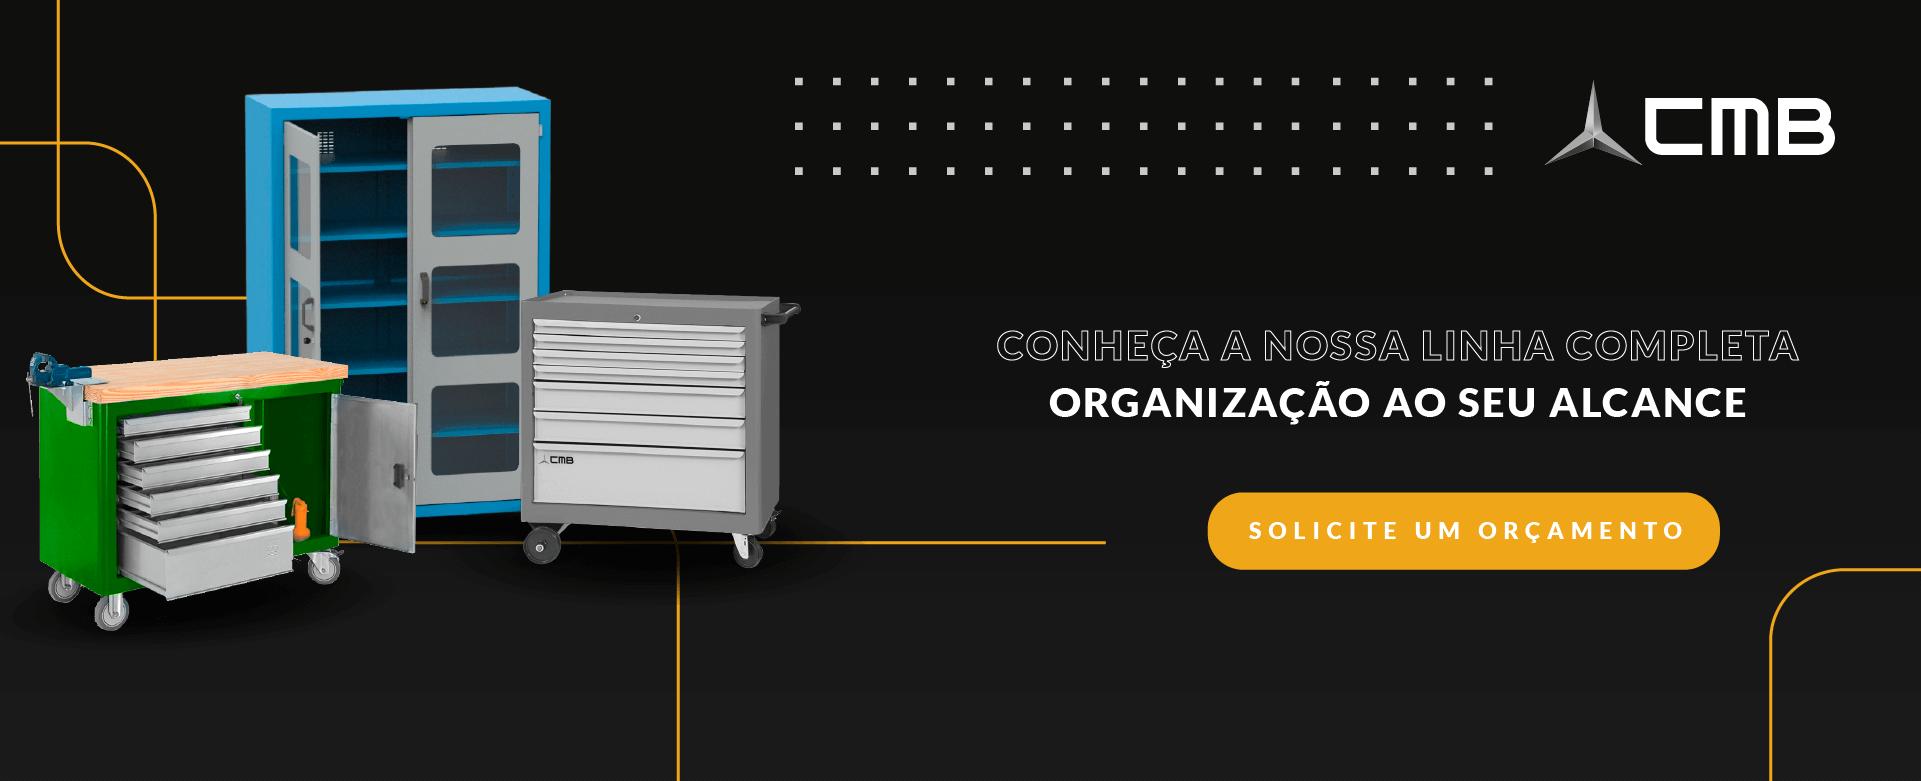 Post Linha Completa_Banner Site - Desktop (1)